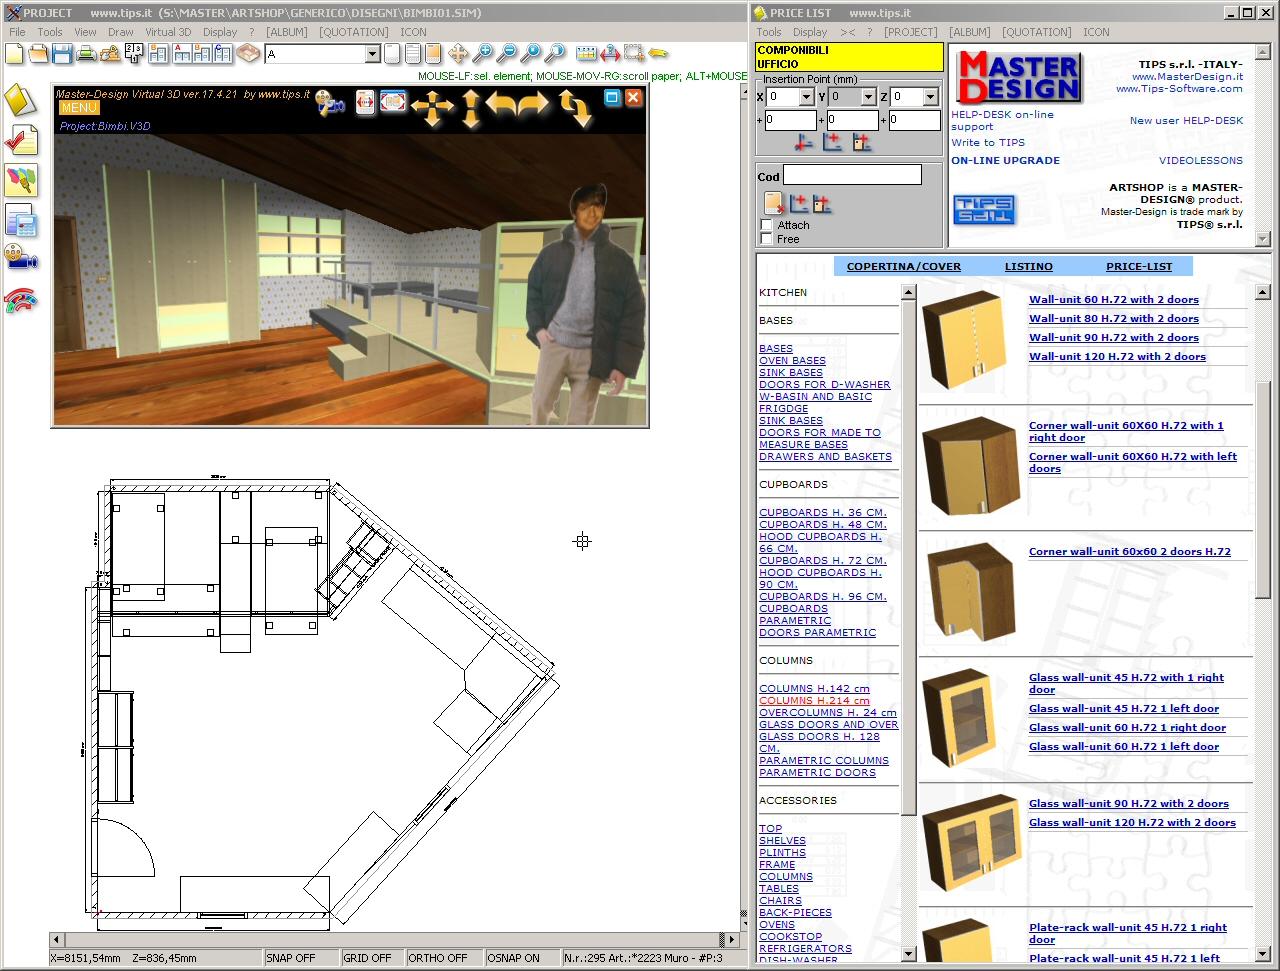 kitchen cabinet software mid century modern table filegets master design art shop x lite screenshot